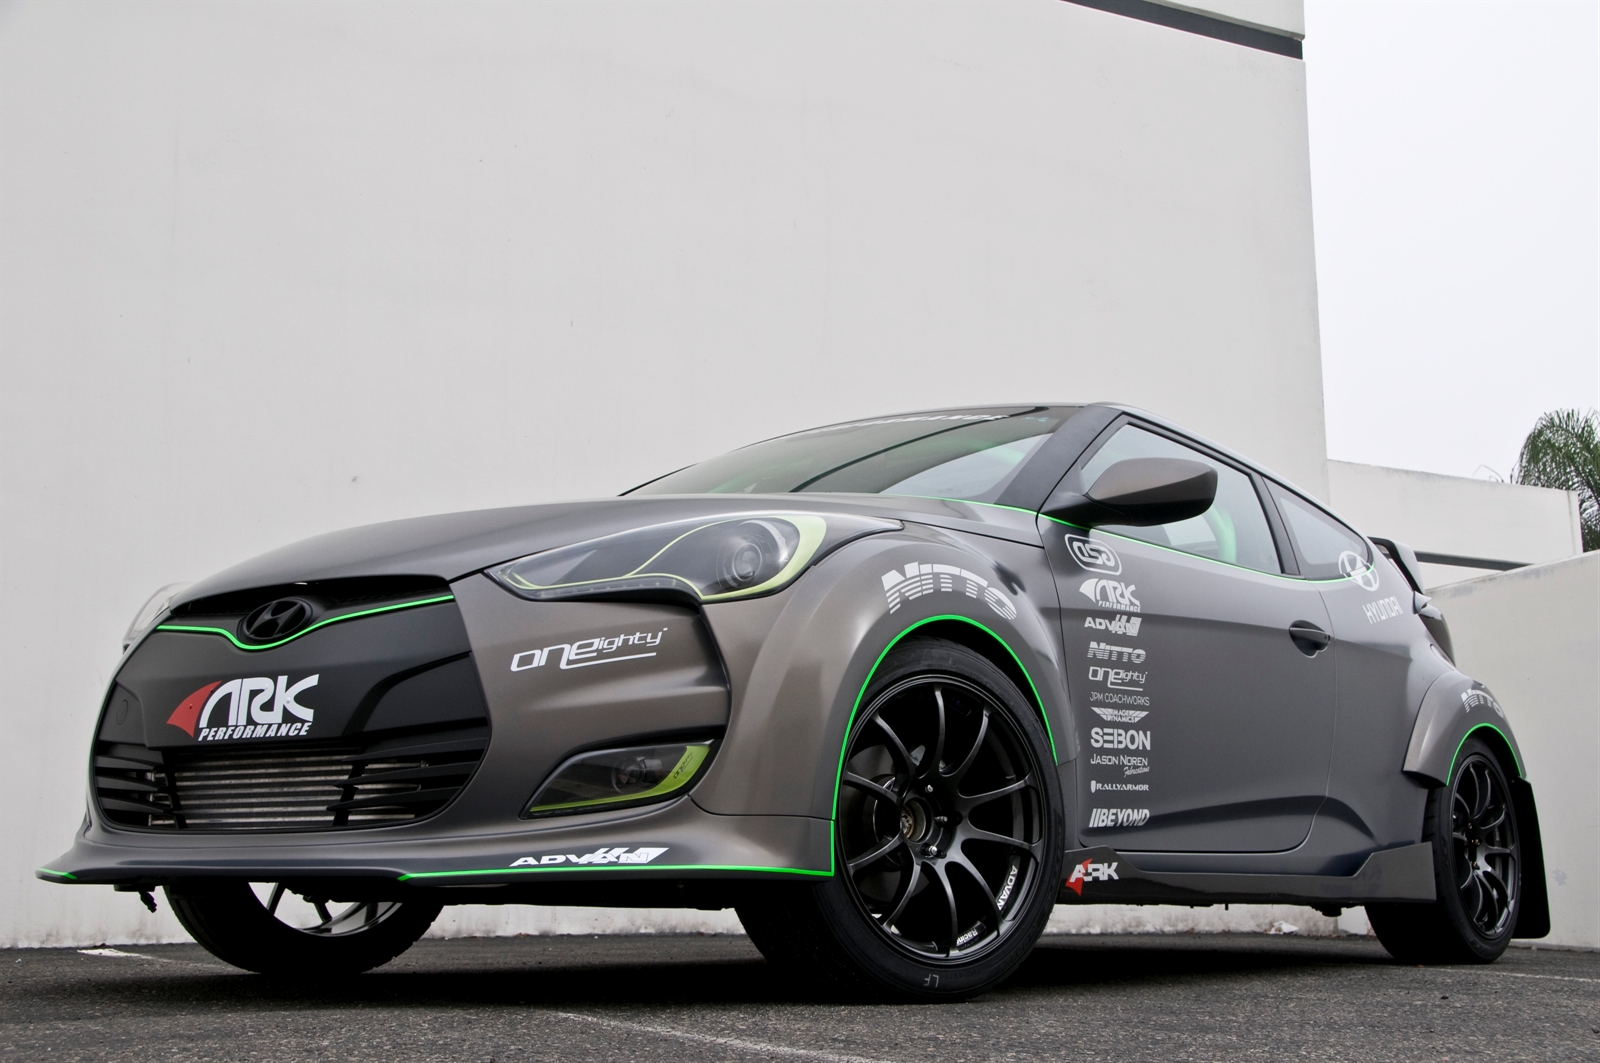 2011 SEMA ARK Performance Hyundai Veloster Unveiled